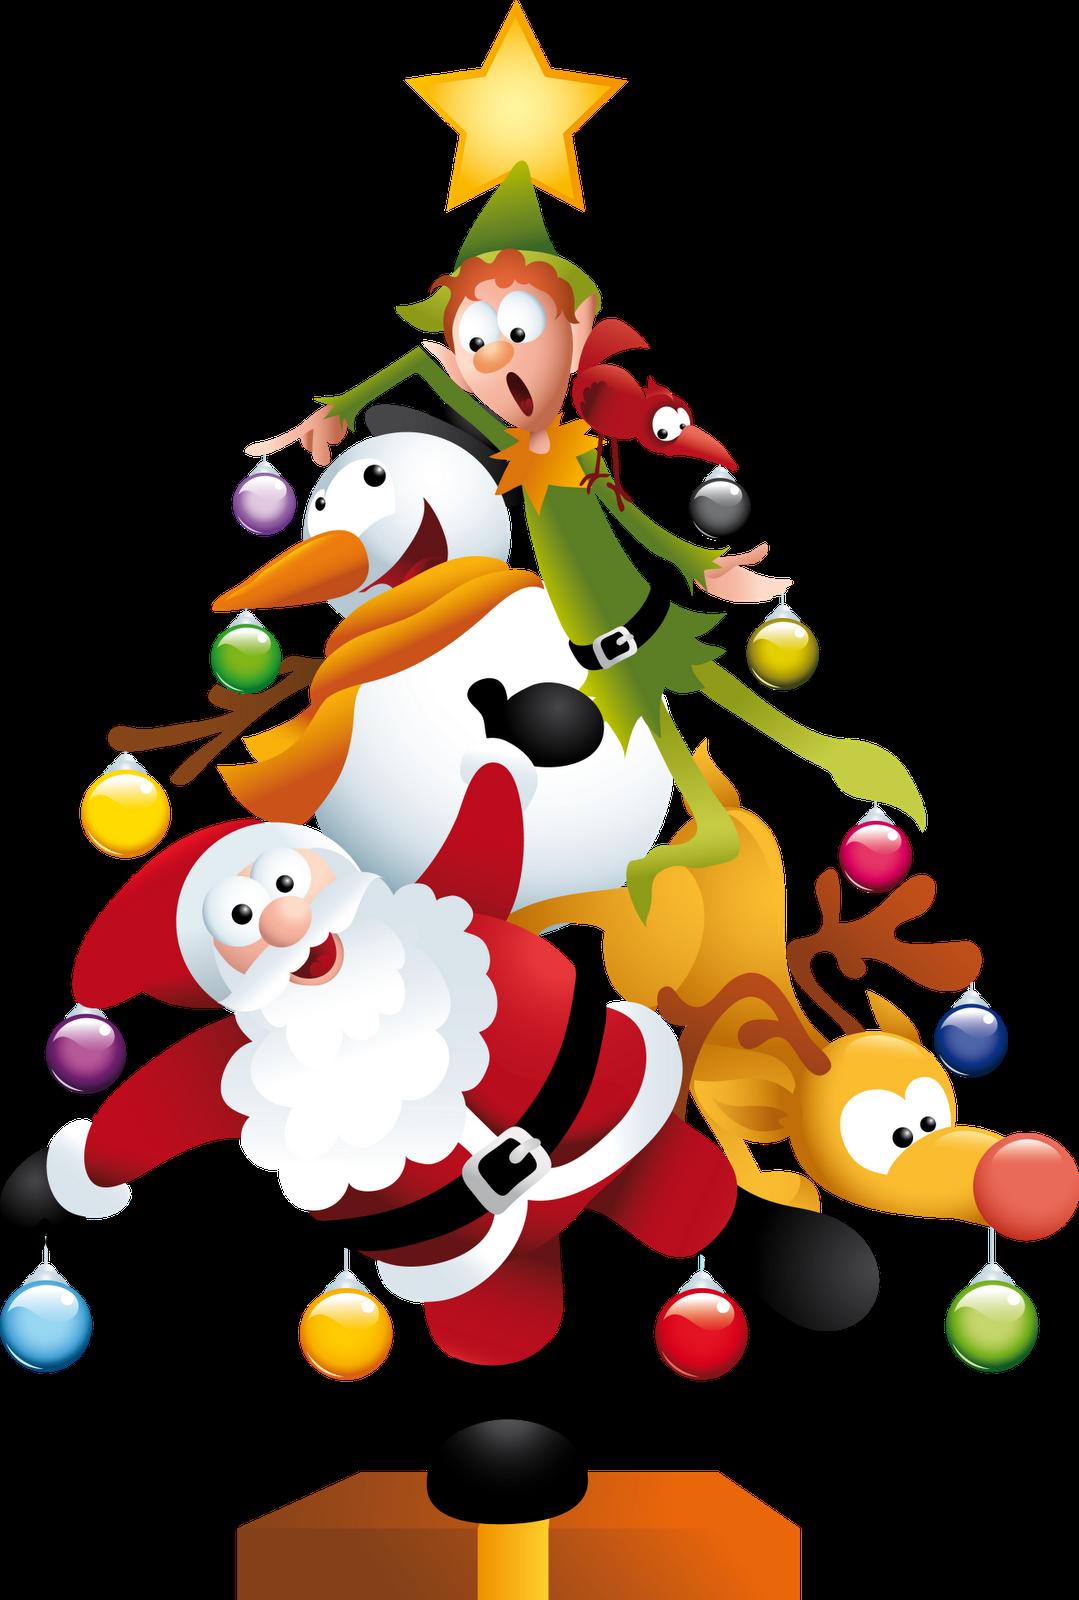 Goofy christmas clipart clip art download papai noel png - Pesquisa Google | Karácsony | Pinterest | Xmas ... clip art download